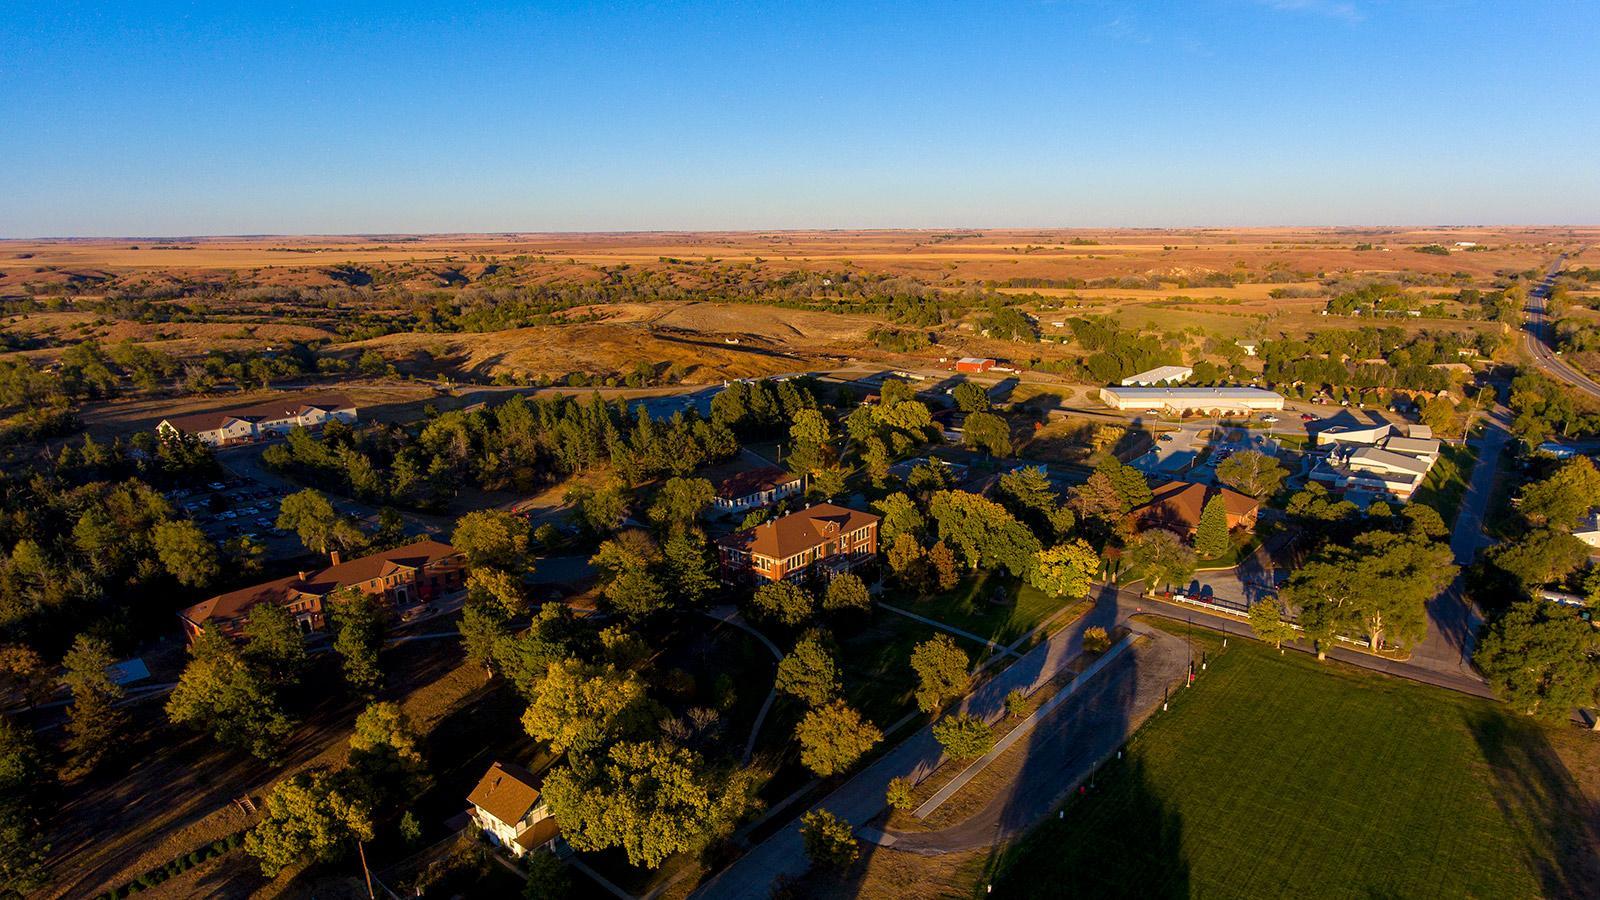 NCTA campus aerial view